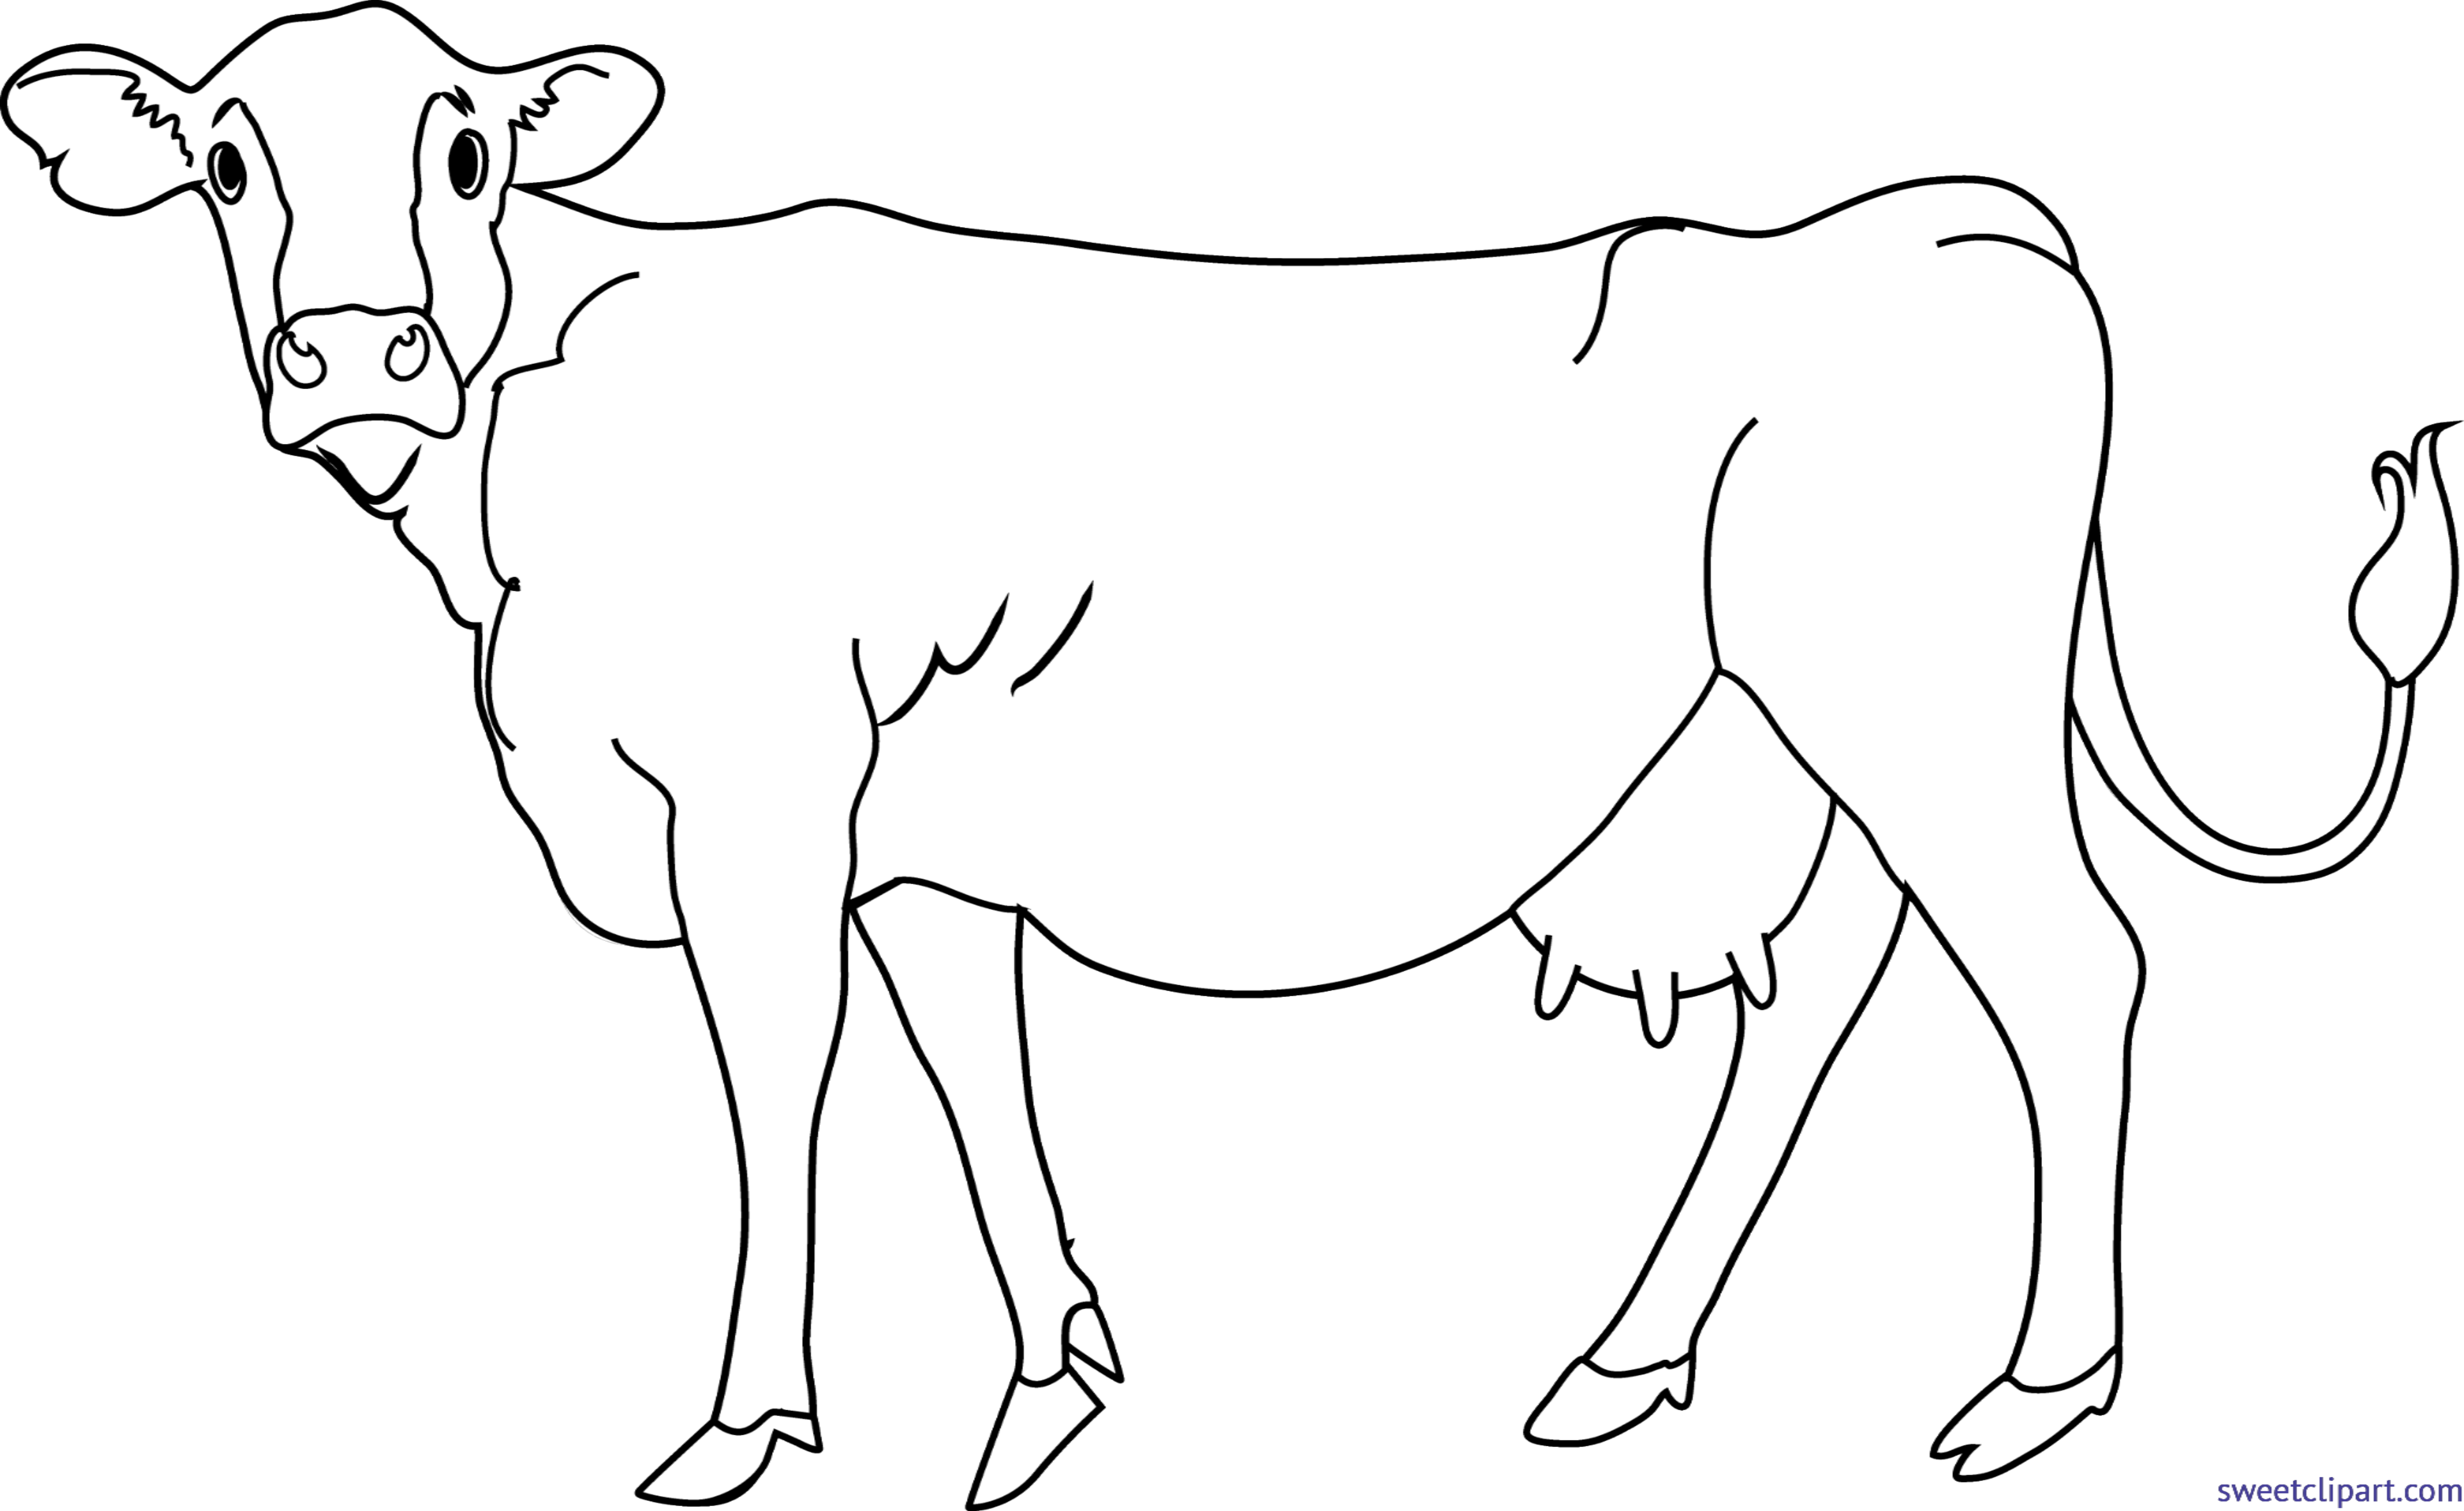 Cow lineart clip art. Horn clipart cow's